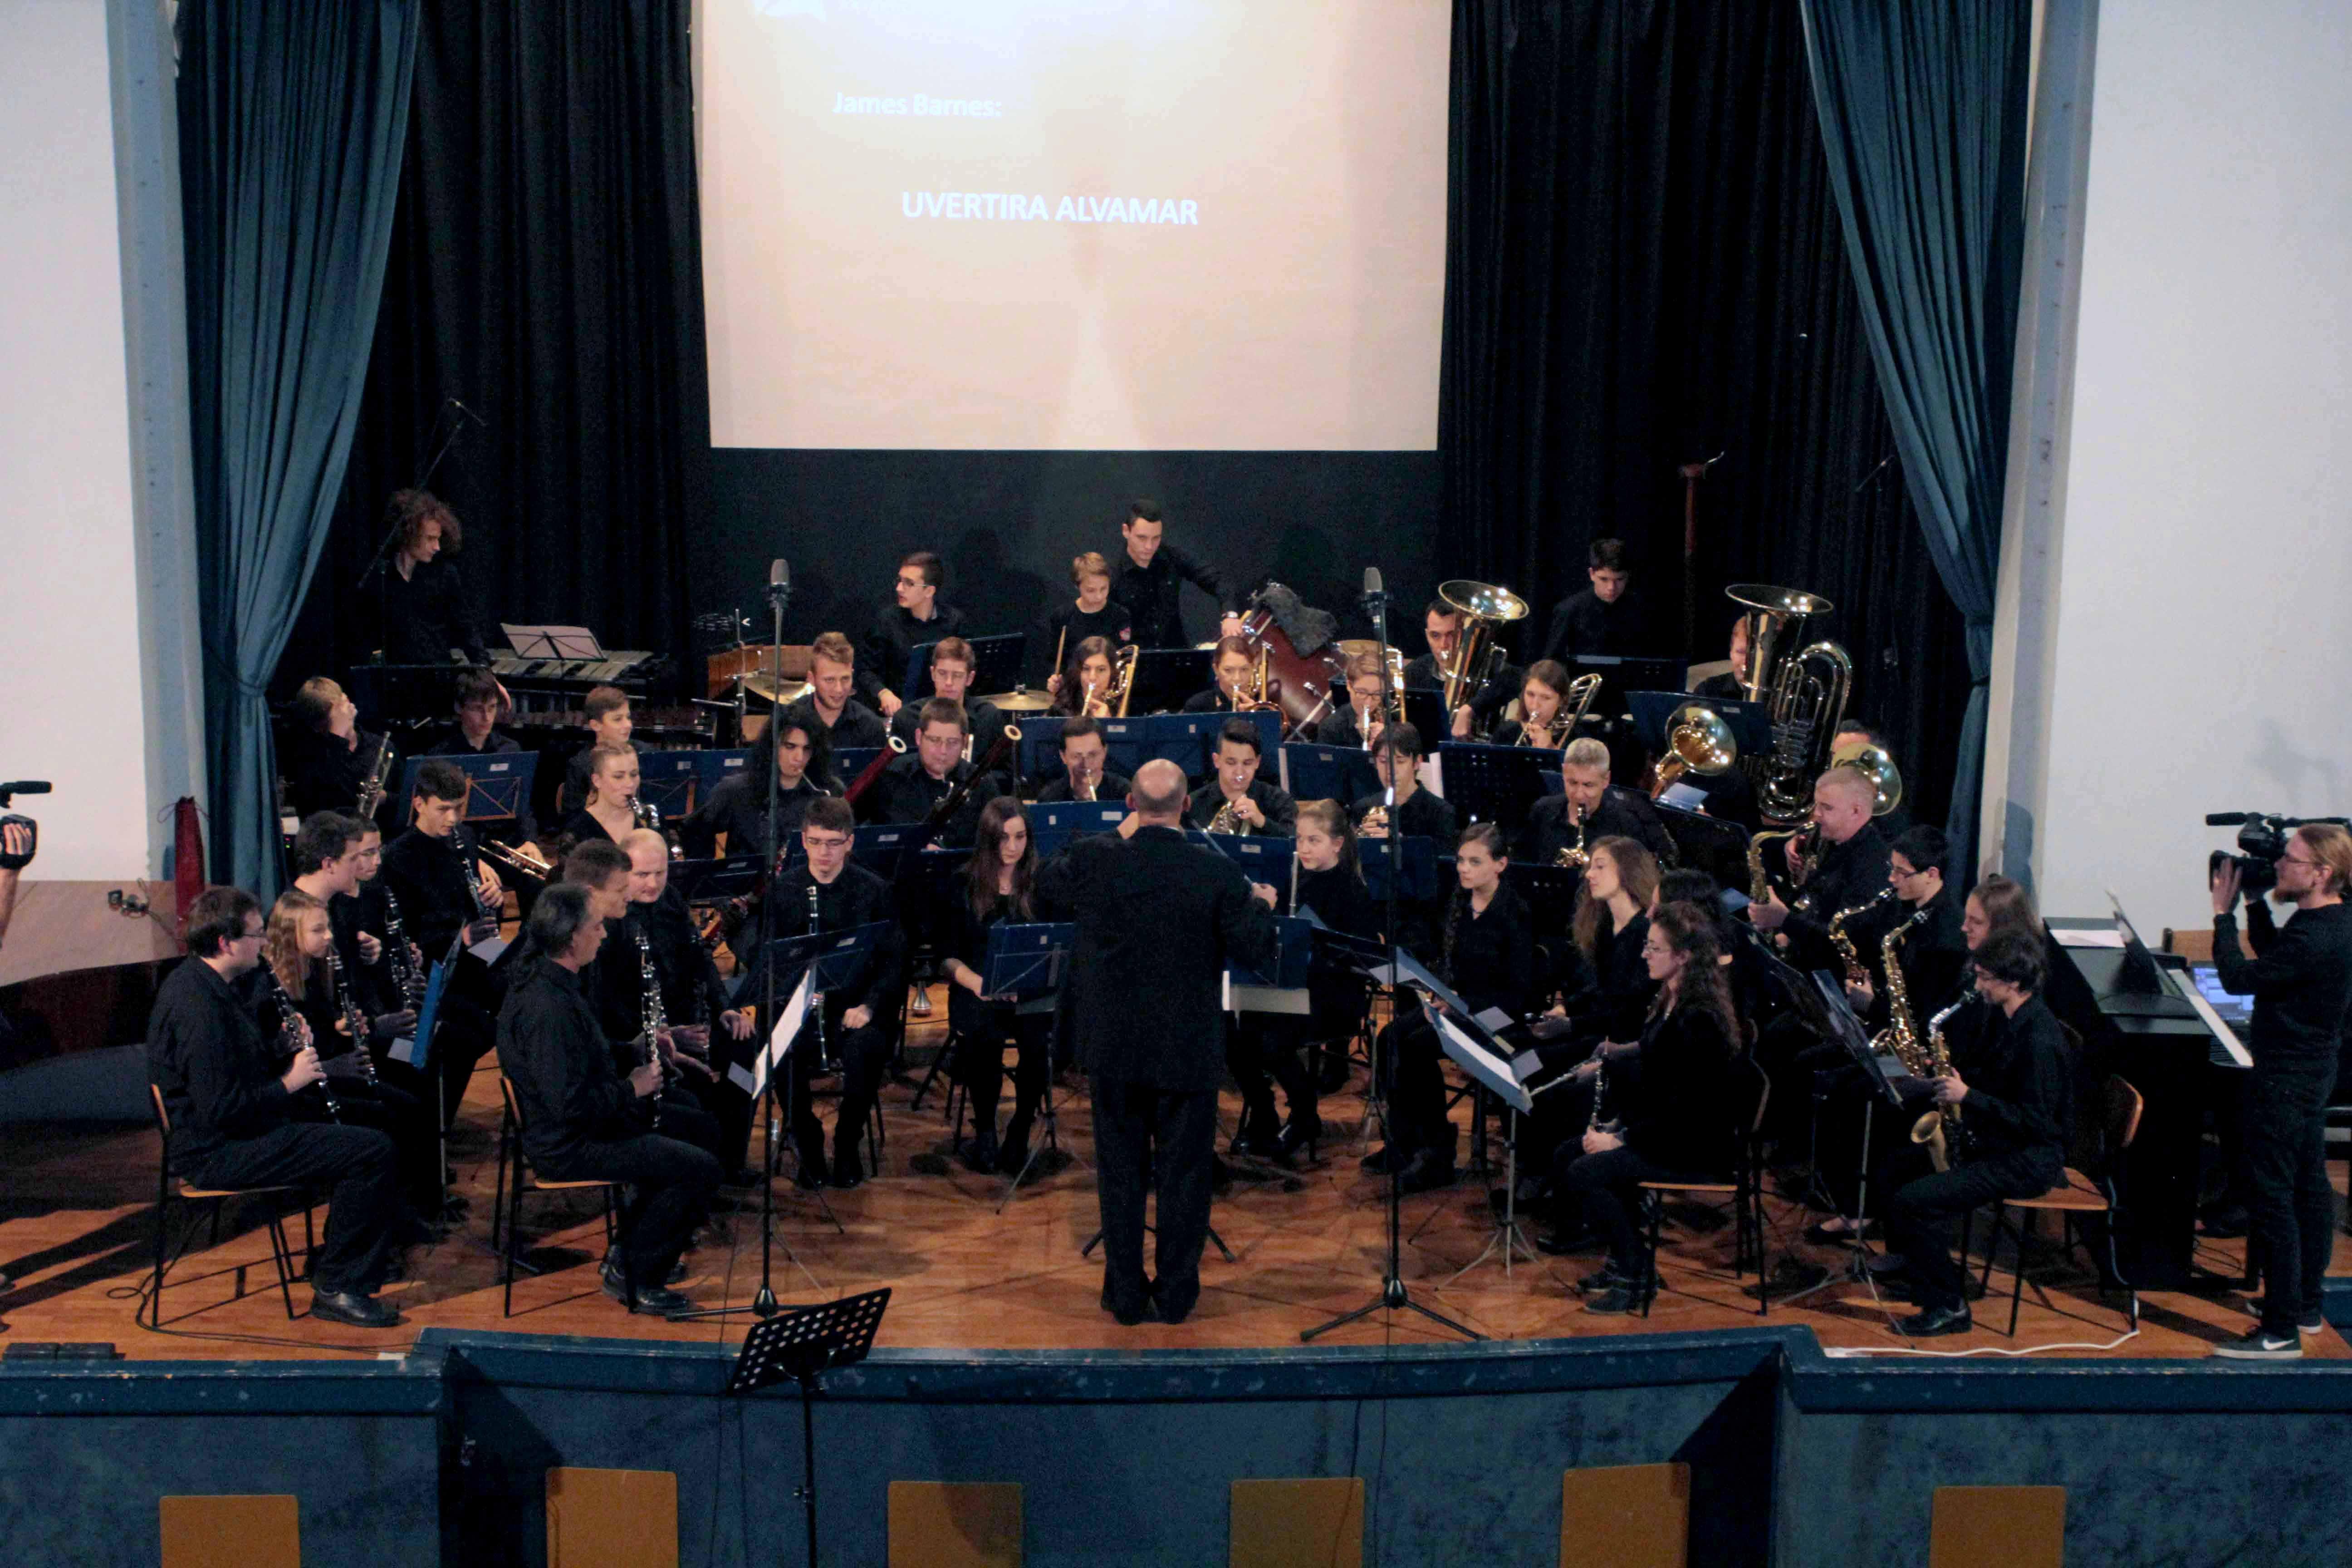 8-godisnji-koncert-puhacki-orkestar-2016-by-milan-mimi-petic